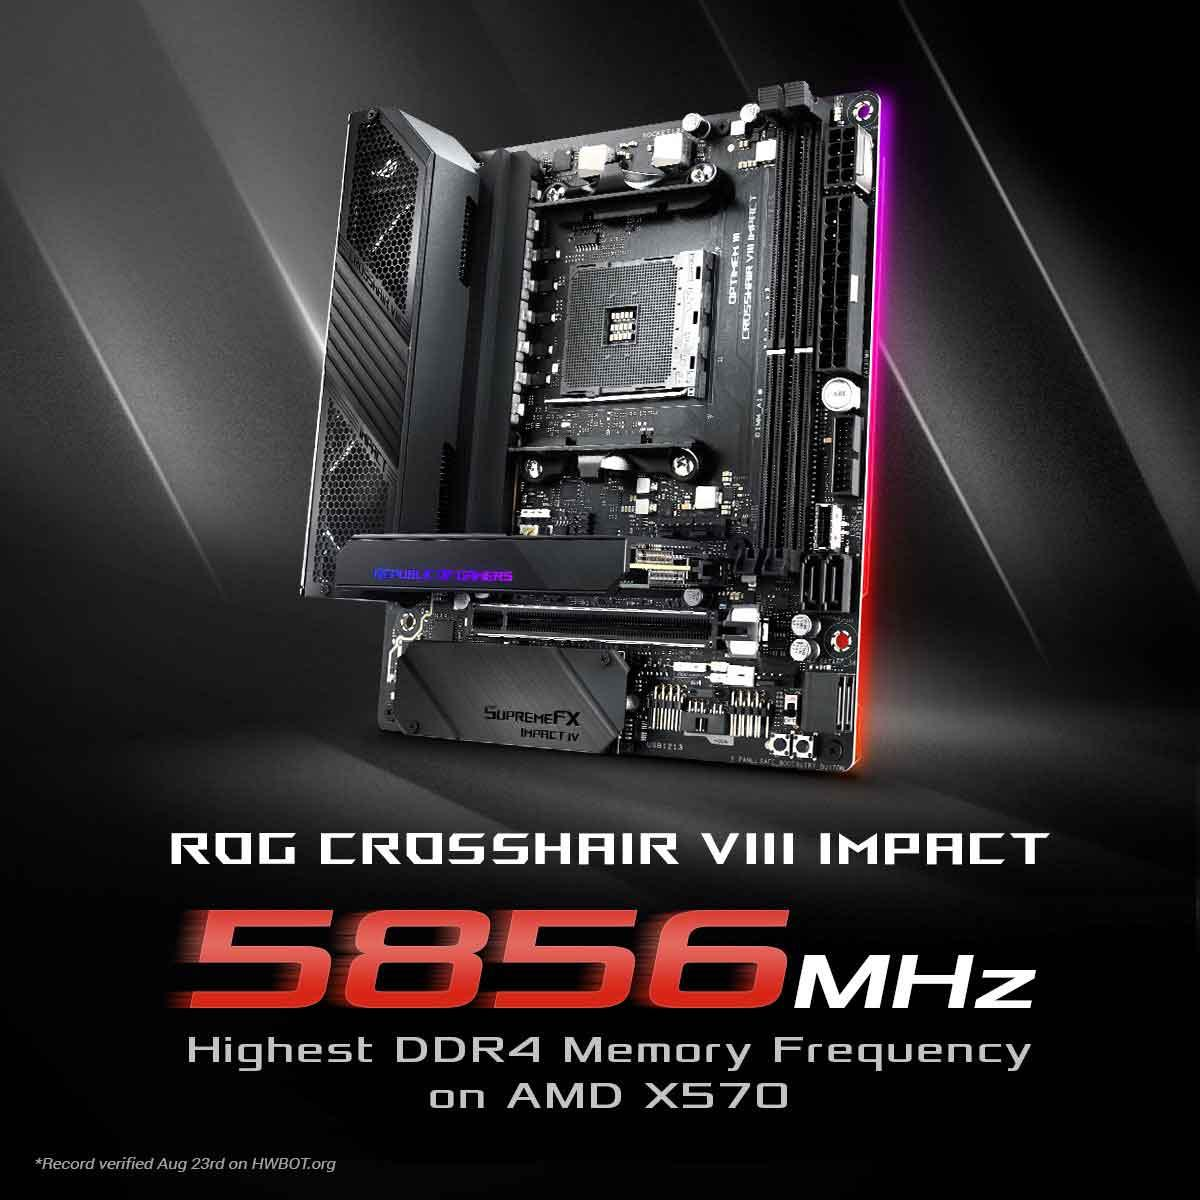 ASUS-ROG-Crosshair-VIII-Impact-and-AMD-Ryzen-3000-CPU-World-Record-Memory-Frequency-Overclock